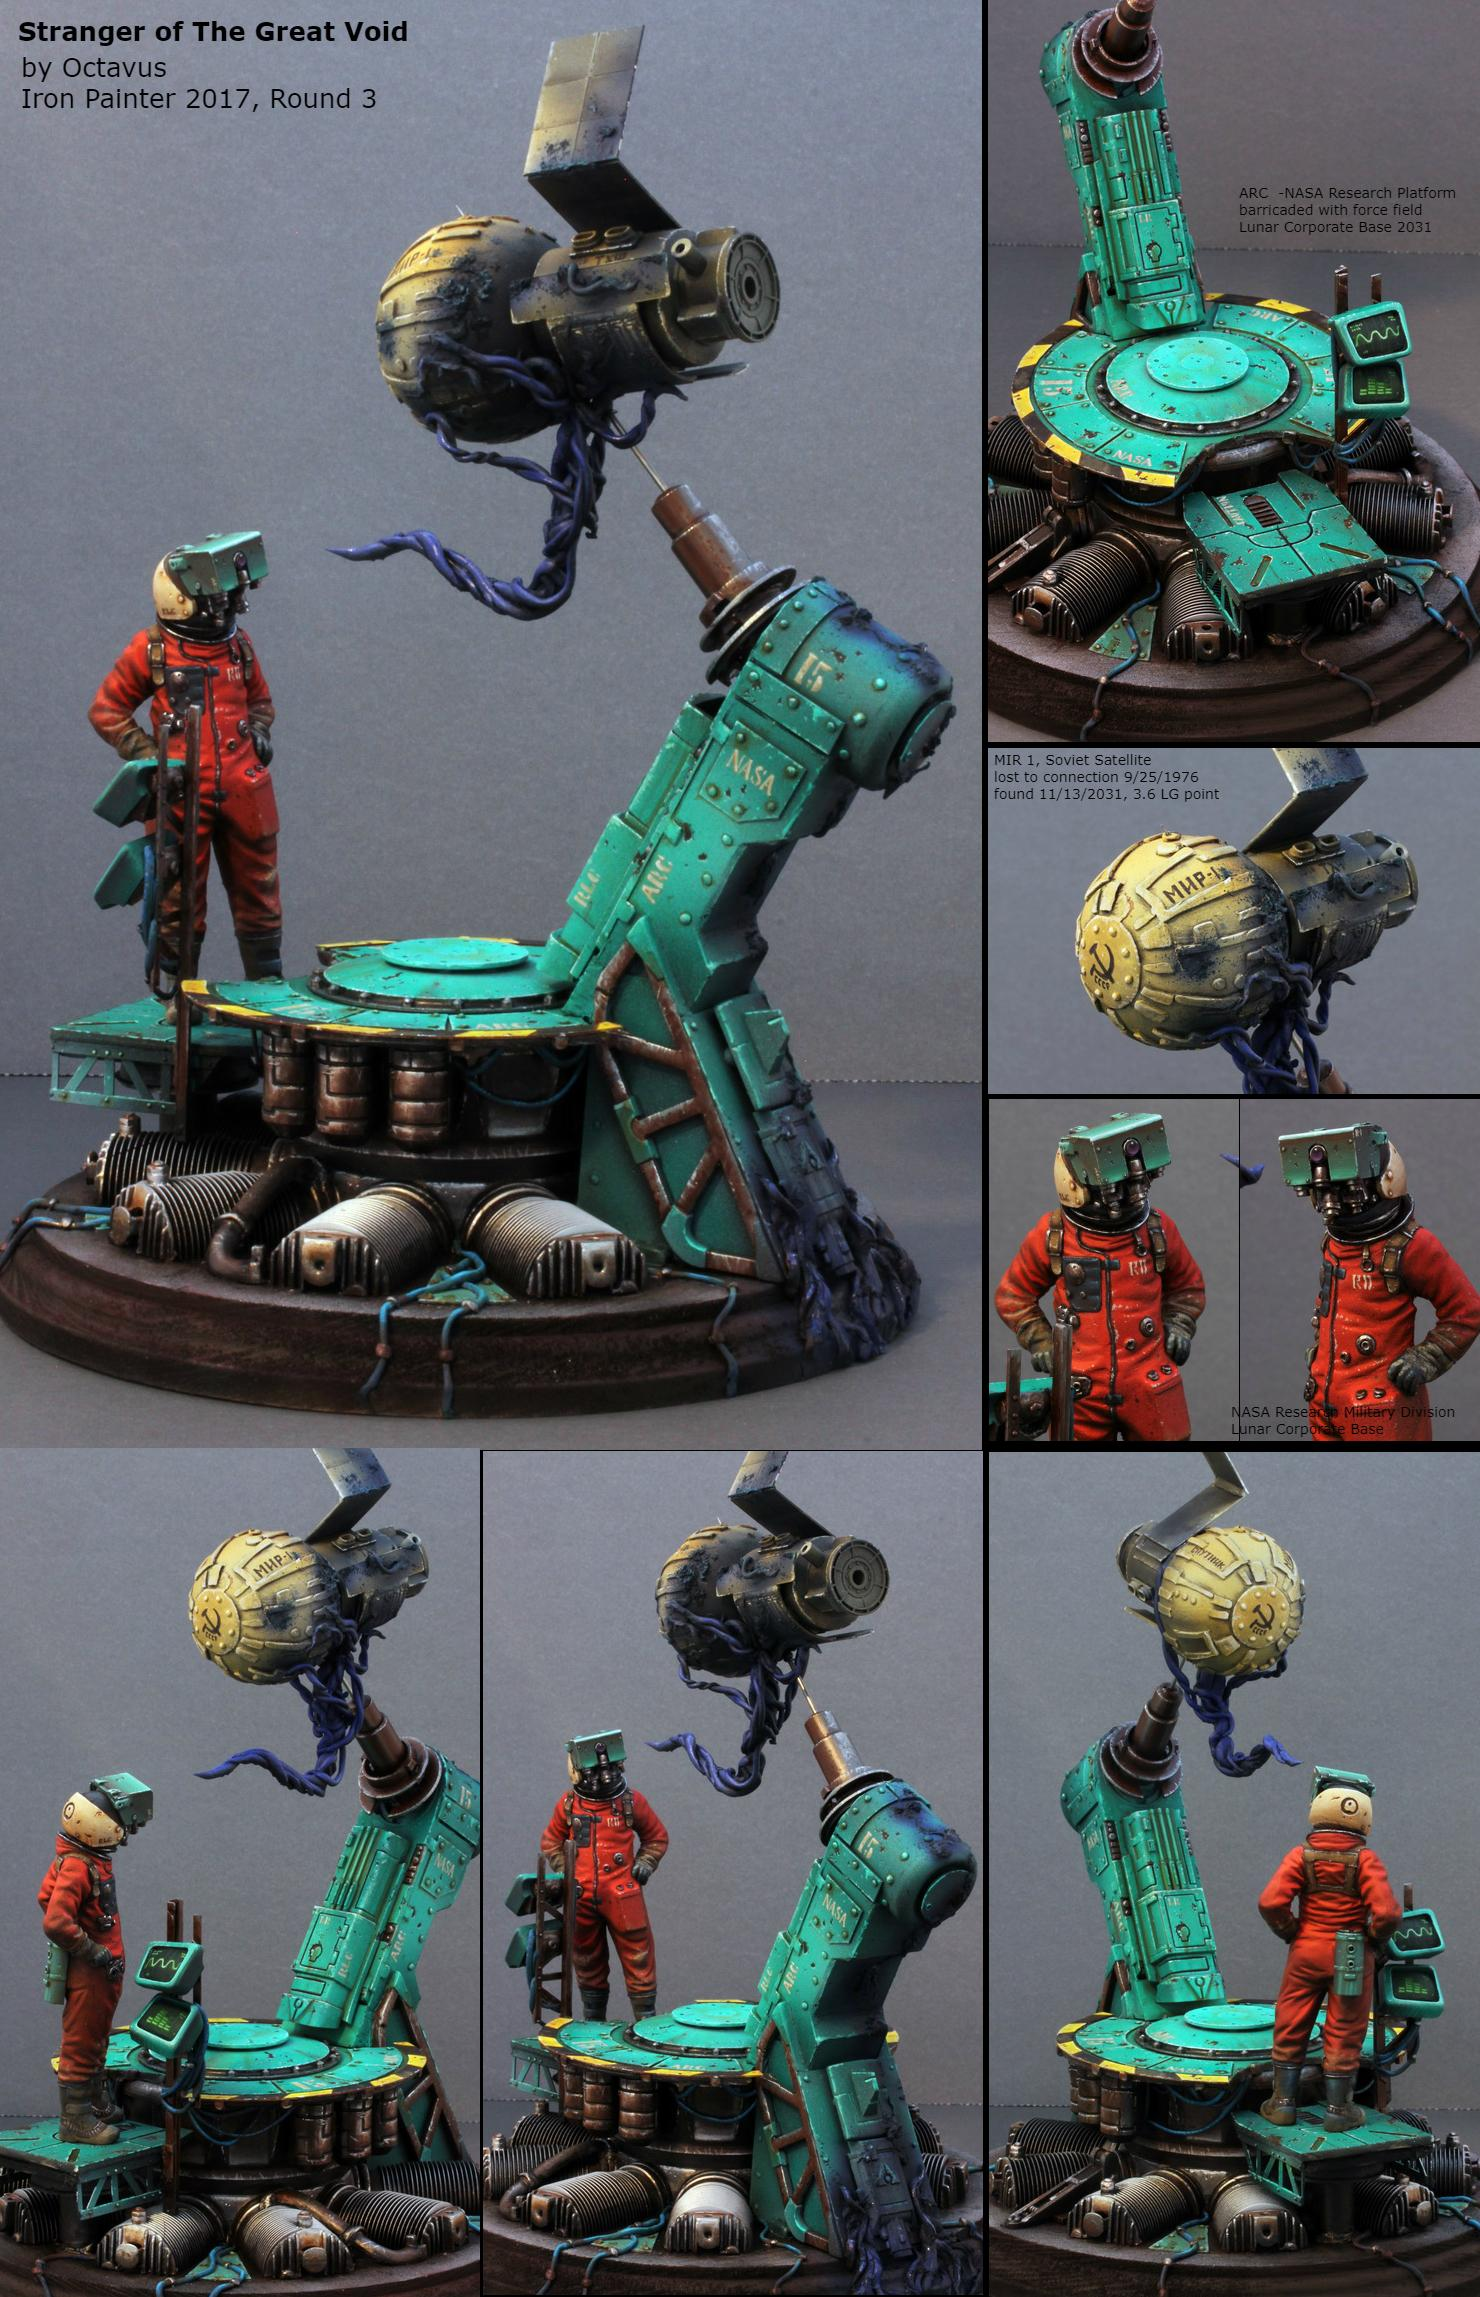 Competition, Fantasy. Prey, Iron Painter, Kingdom Death, System Shock